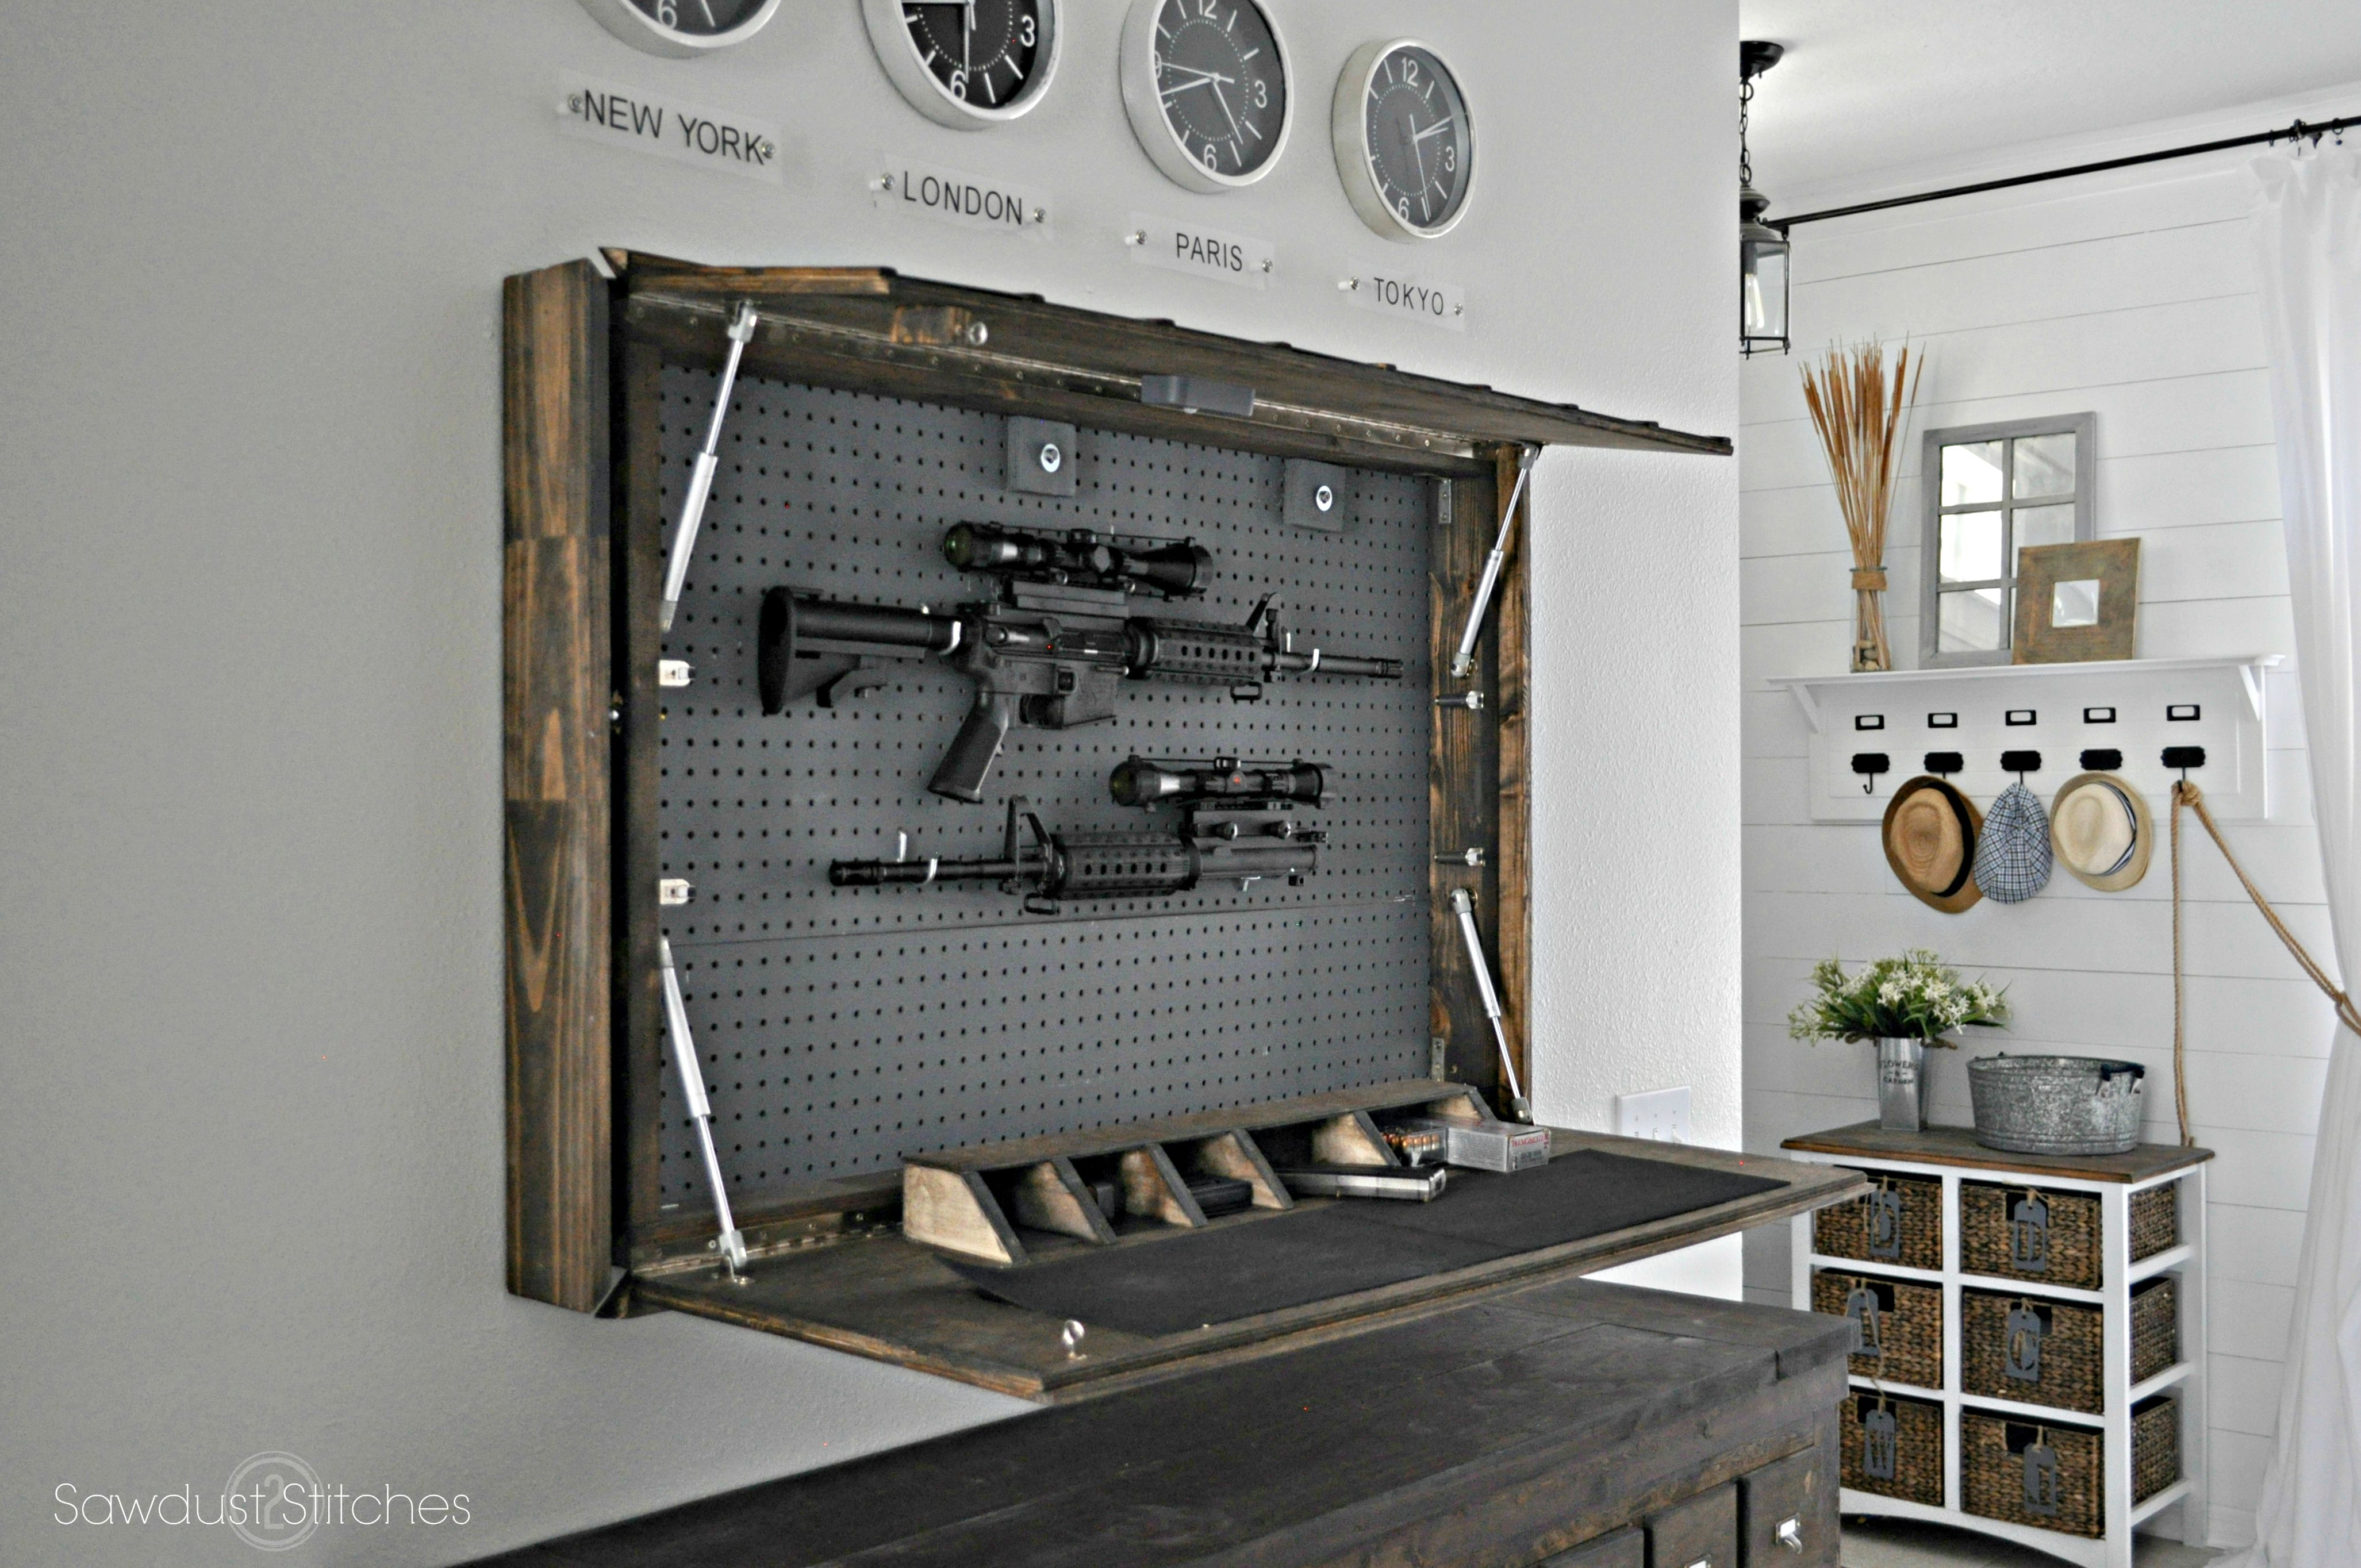 secret diy gun compartment hides behind